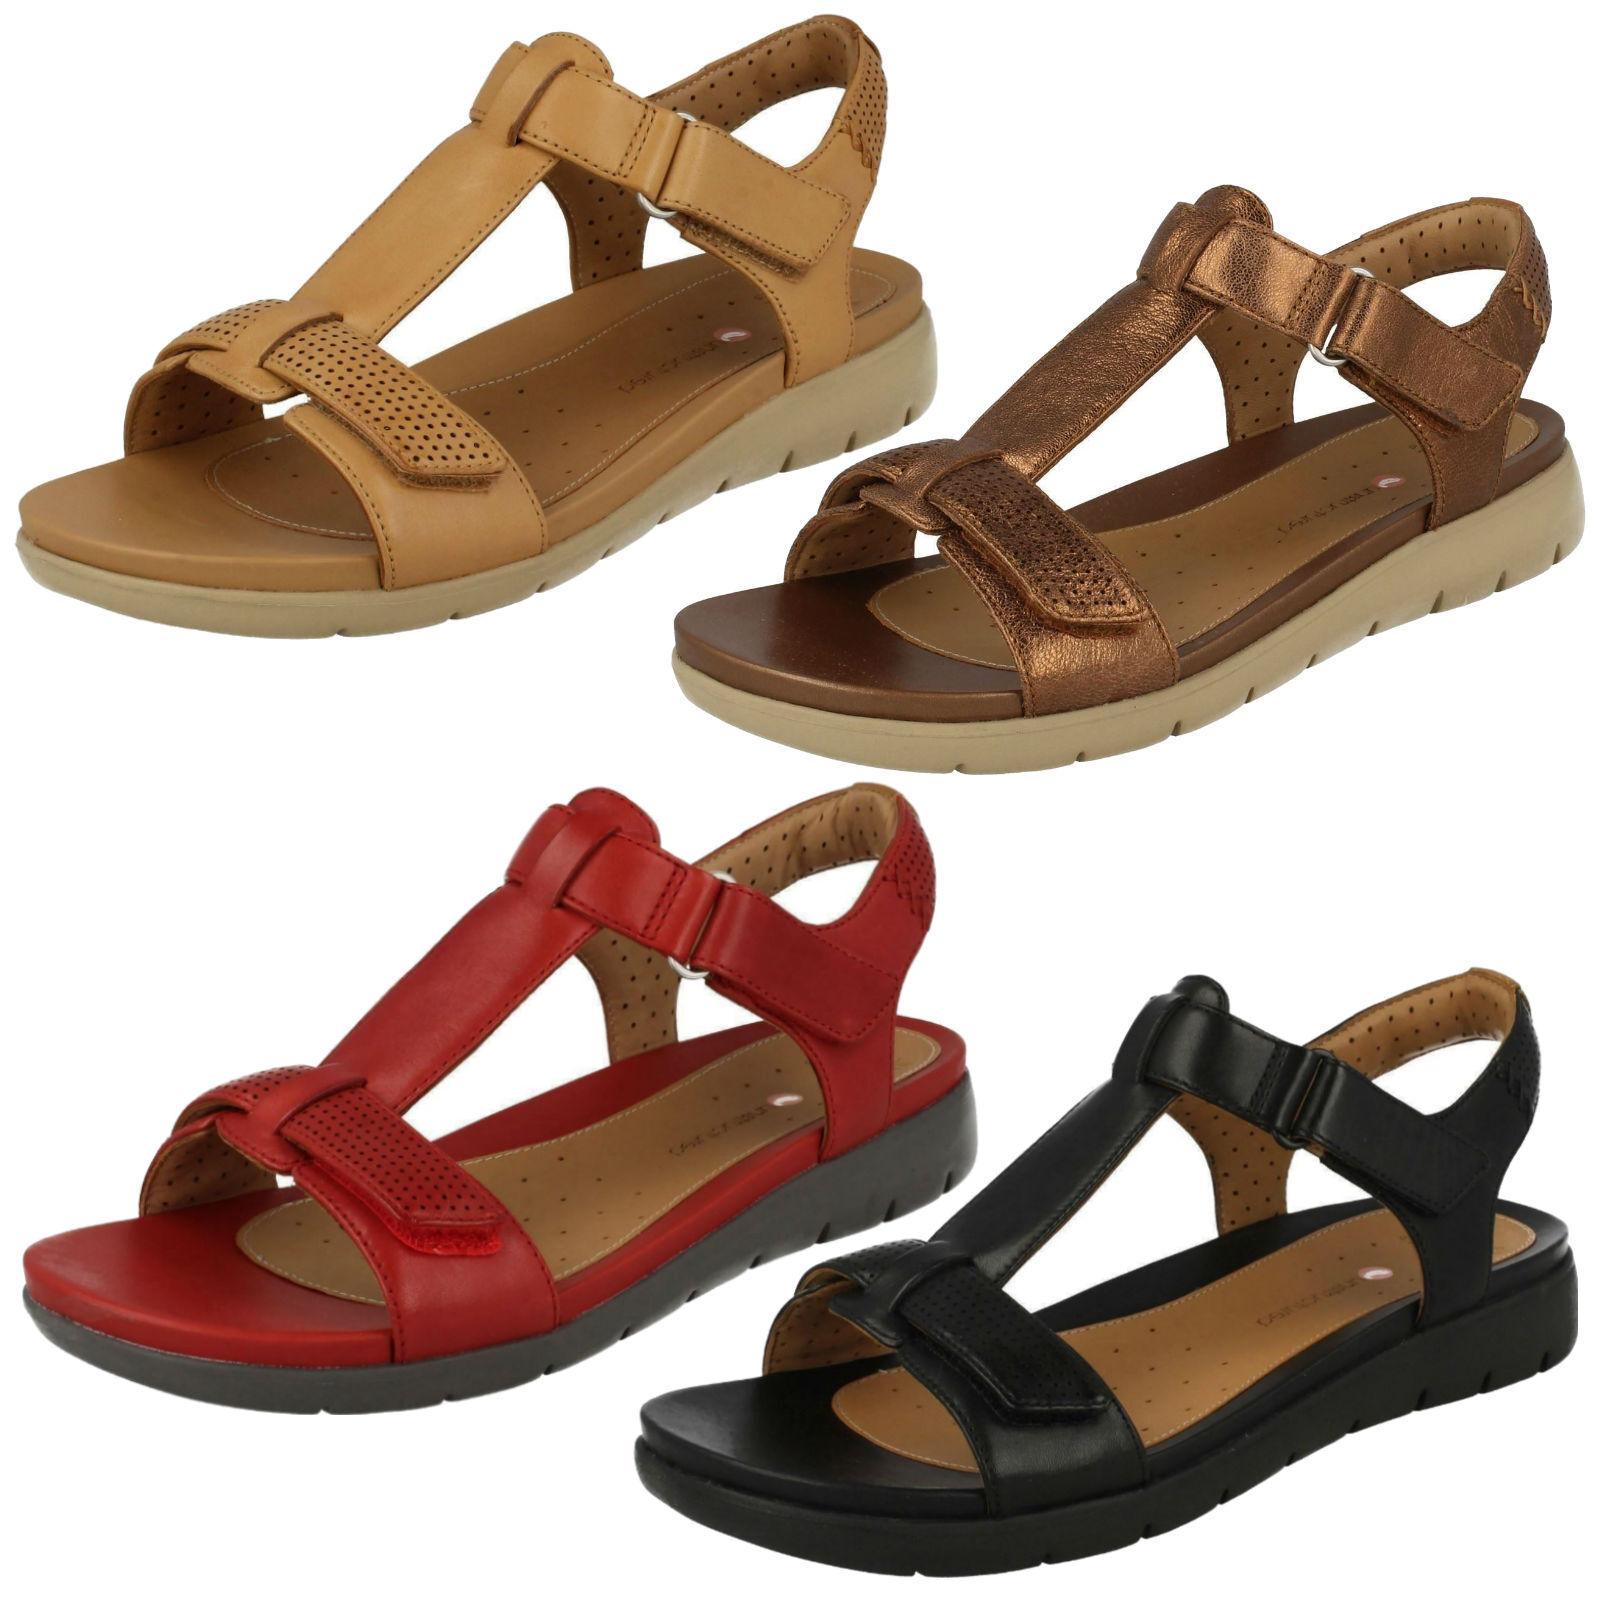 Sandali Donna Clarks in pelle non strutturati Riptape Casual T Bar Estate Sandalo ONU Haywood